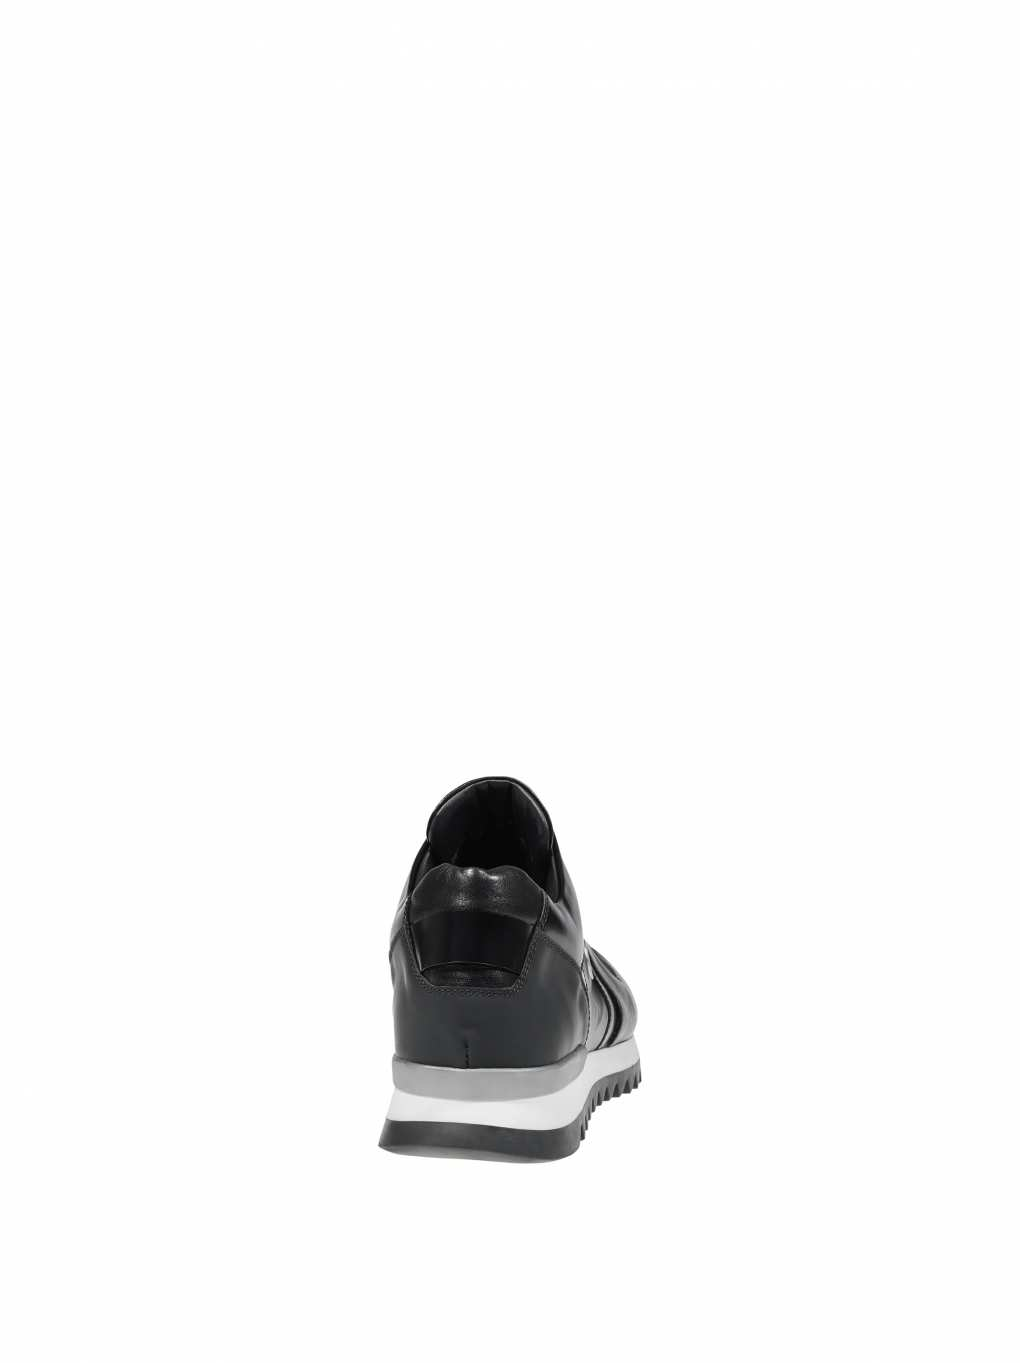 Кроссовки м  Shoes man